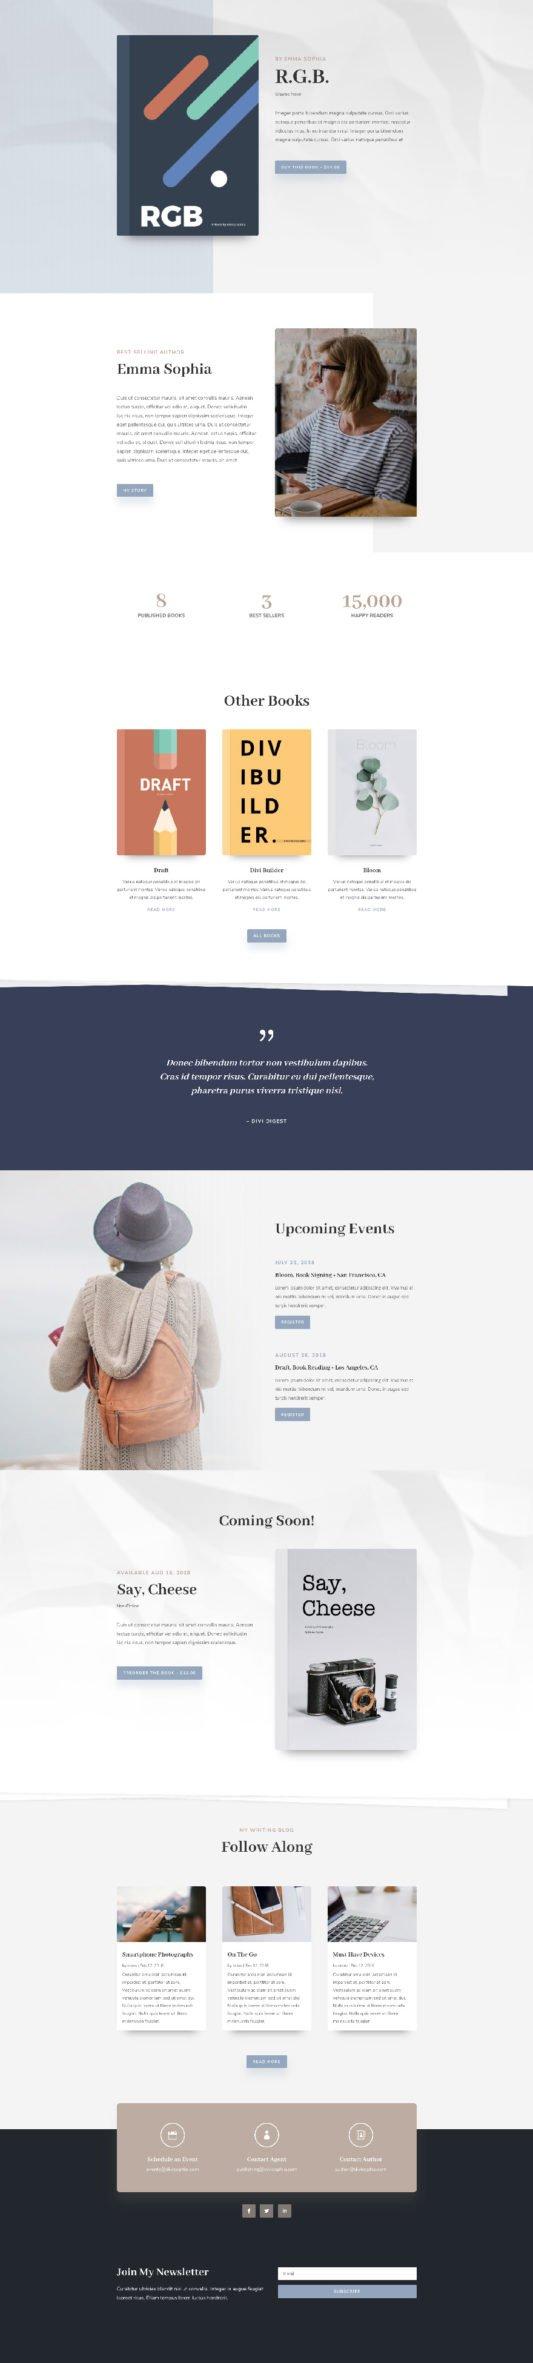 website builder for writers, author website